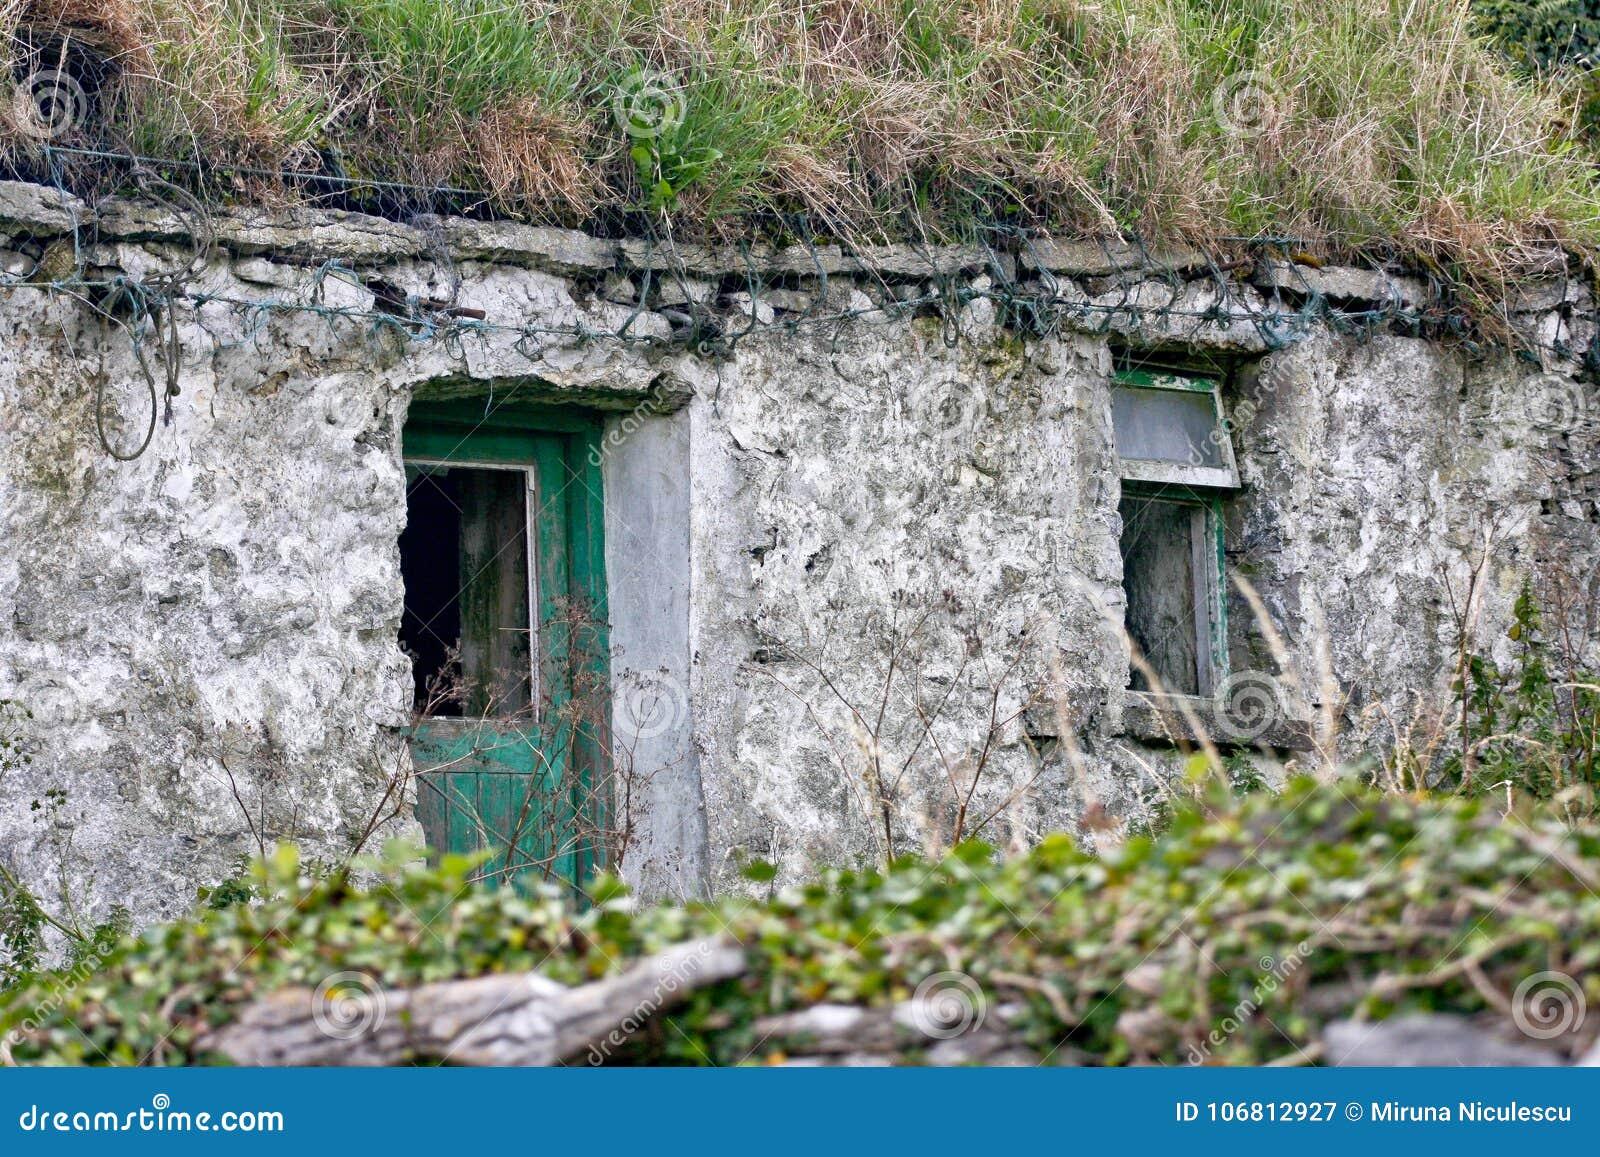 Ruins of a traditional Irish house, Inisheer, Ireland